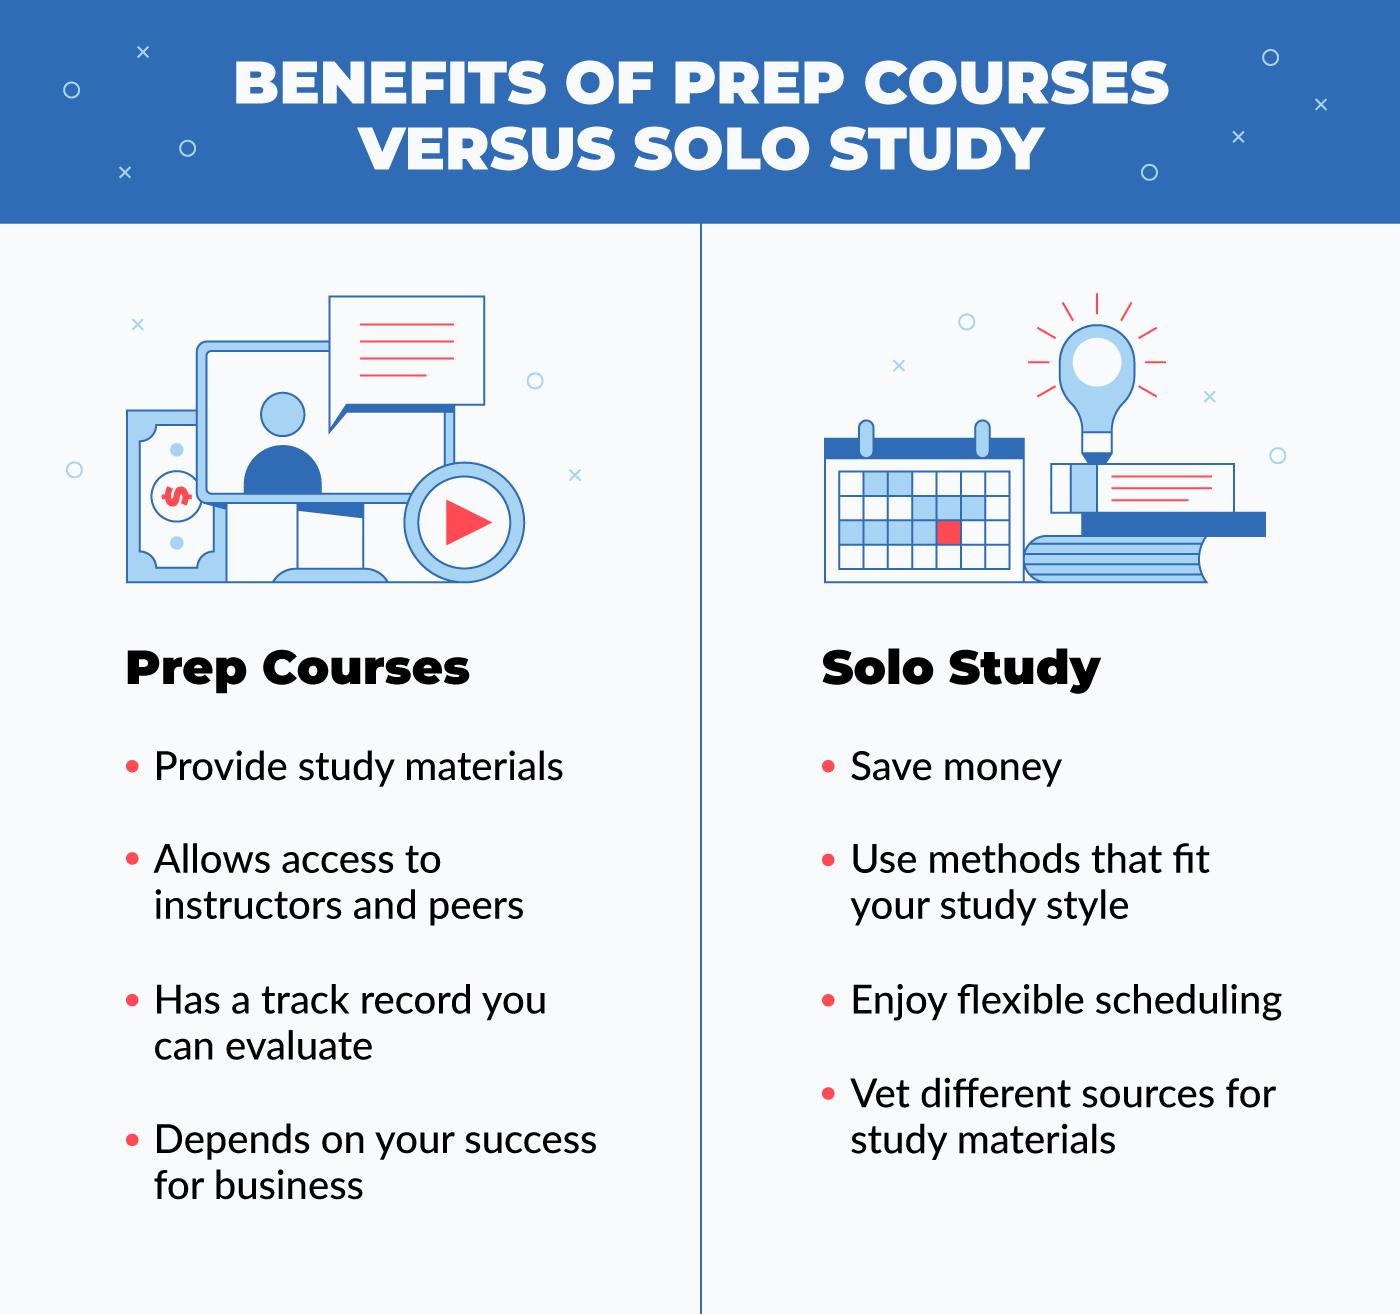 benefits of prep courses versus solo study